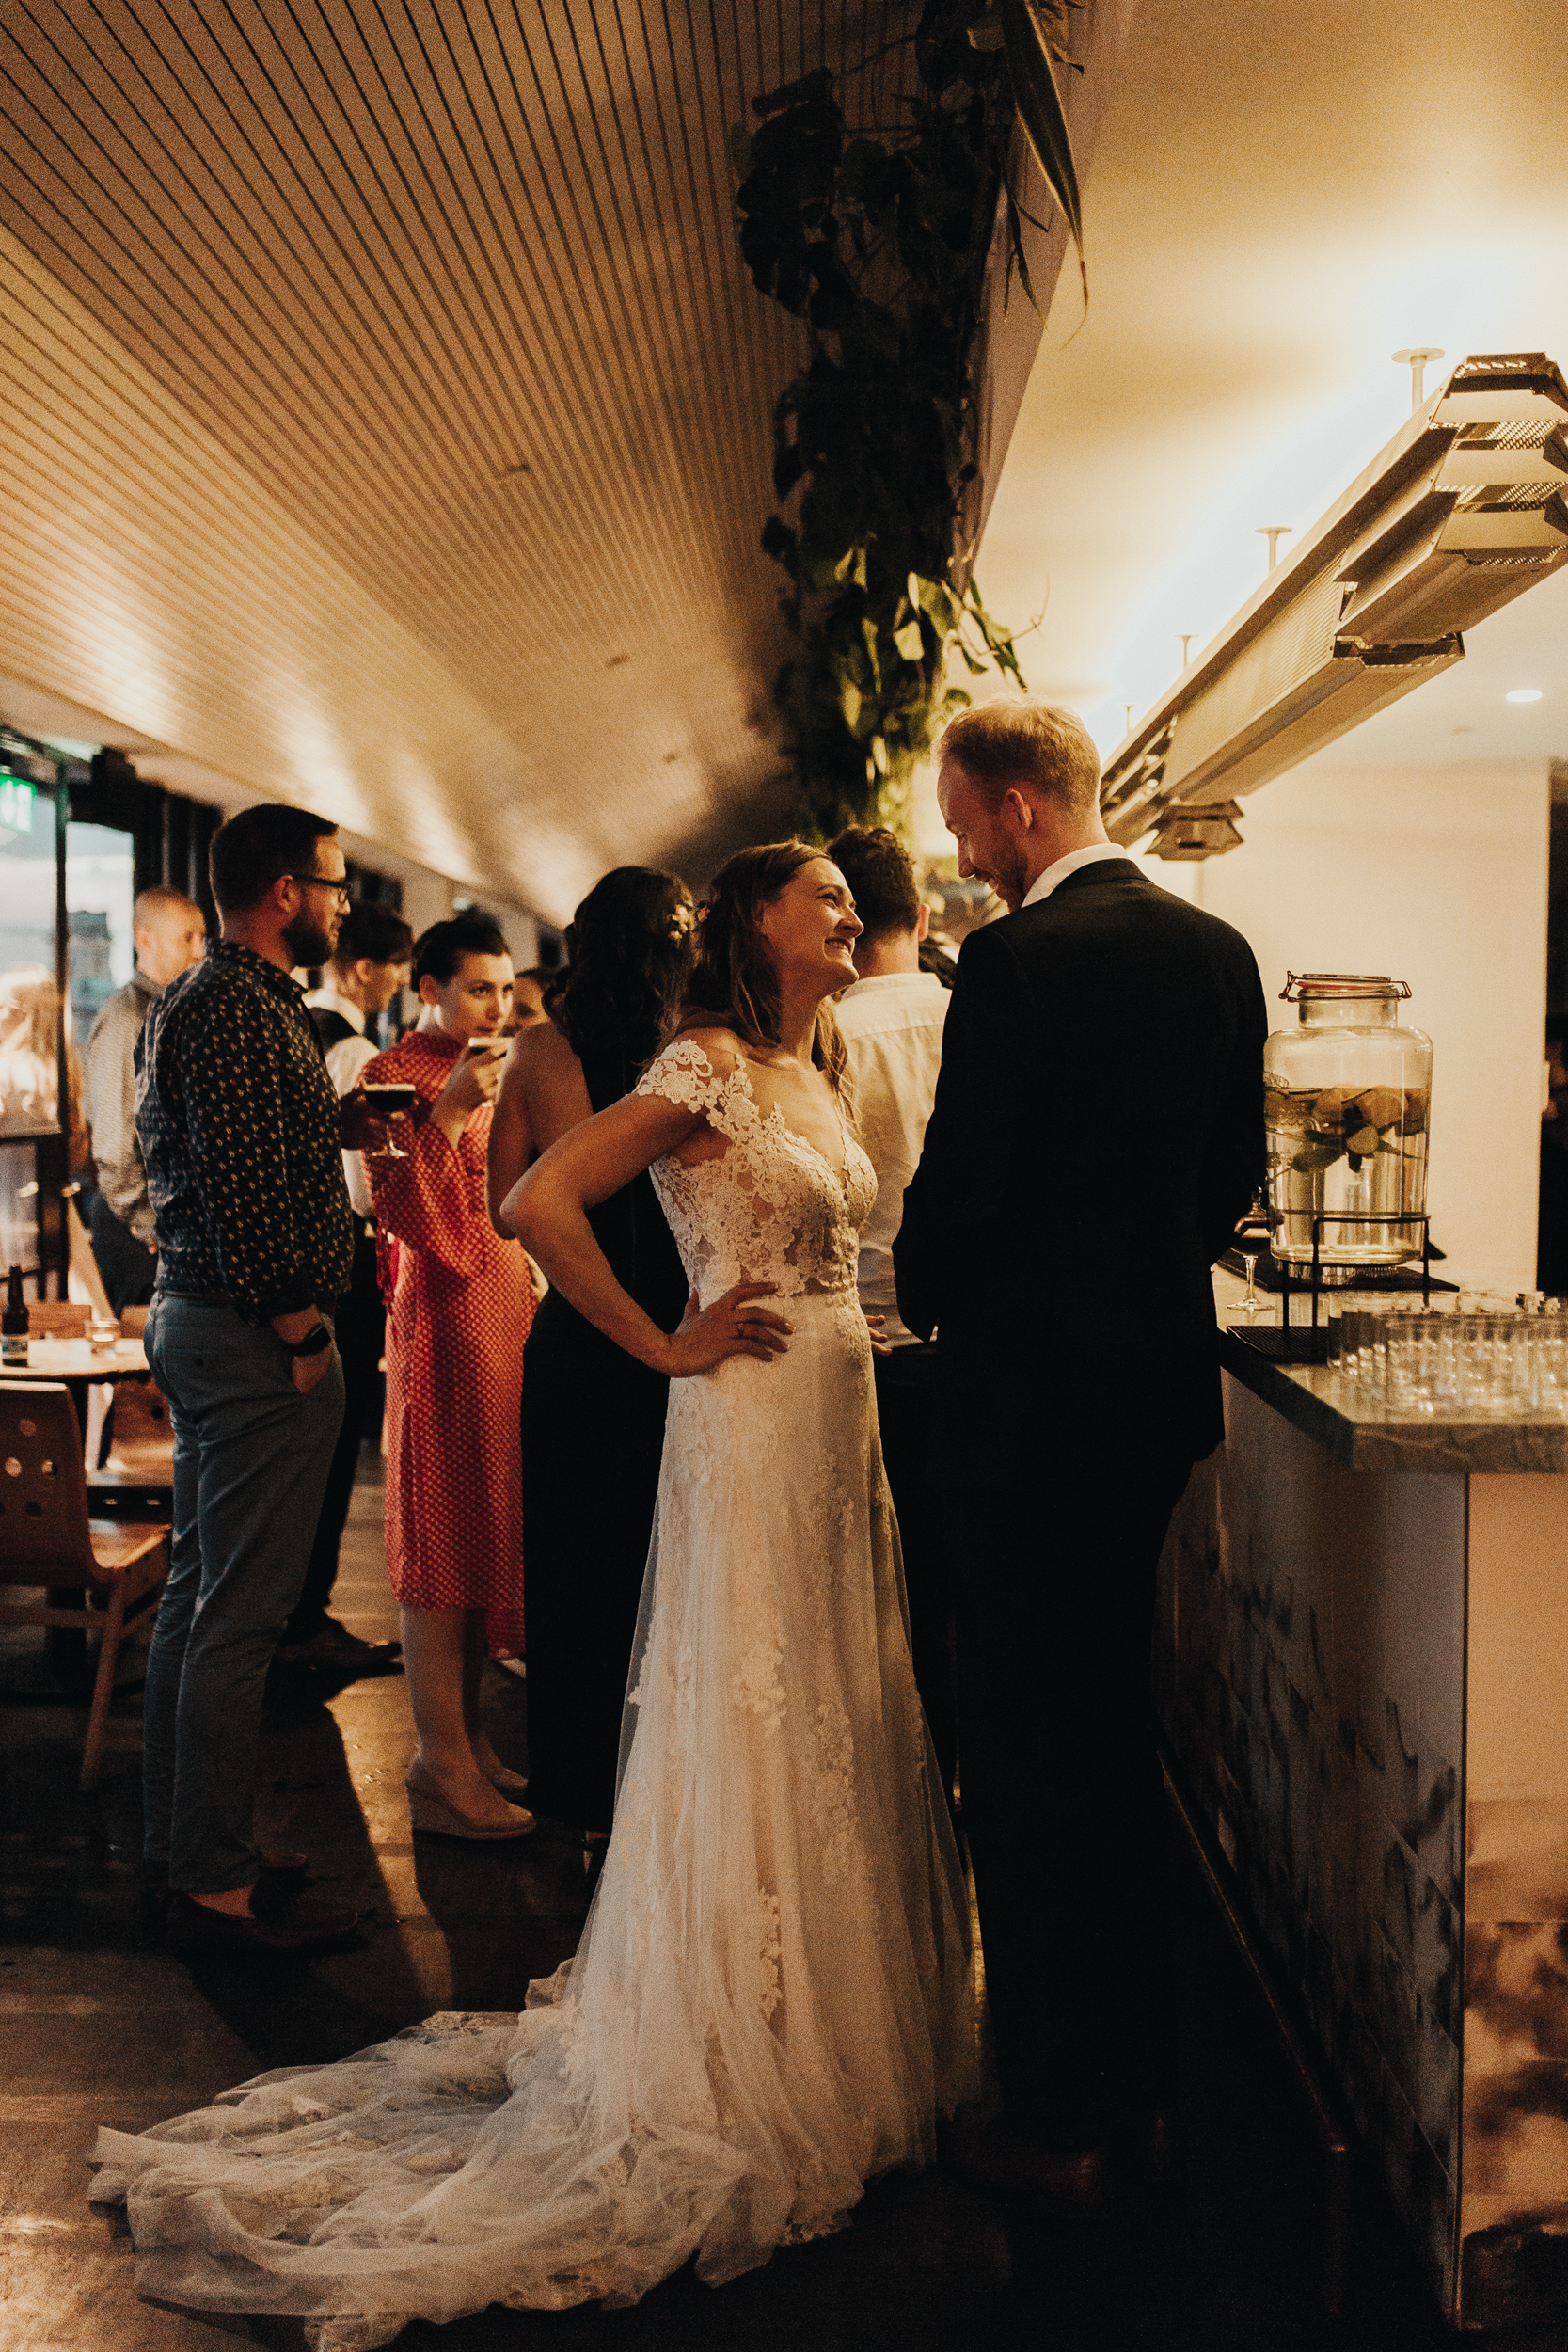 Laura-Benn-The-Asylum-London-The-Ace-Hotel-Wedding-Alternative-Darina-Stoda-Photography-791.jpg